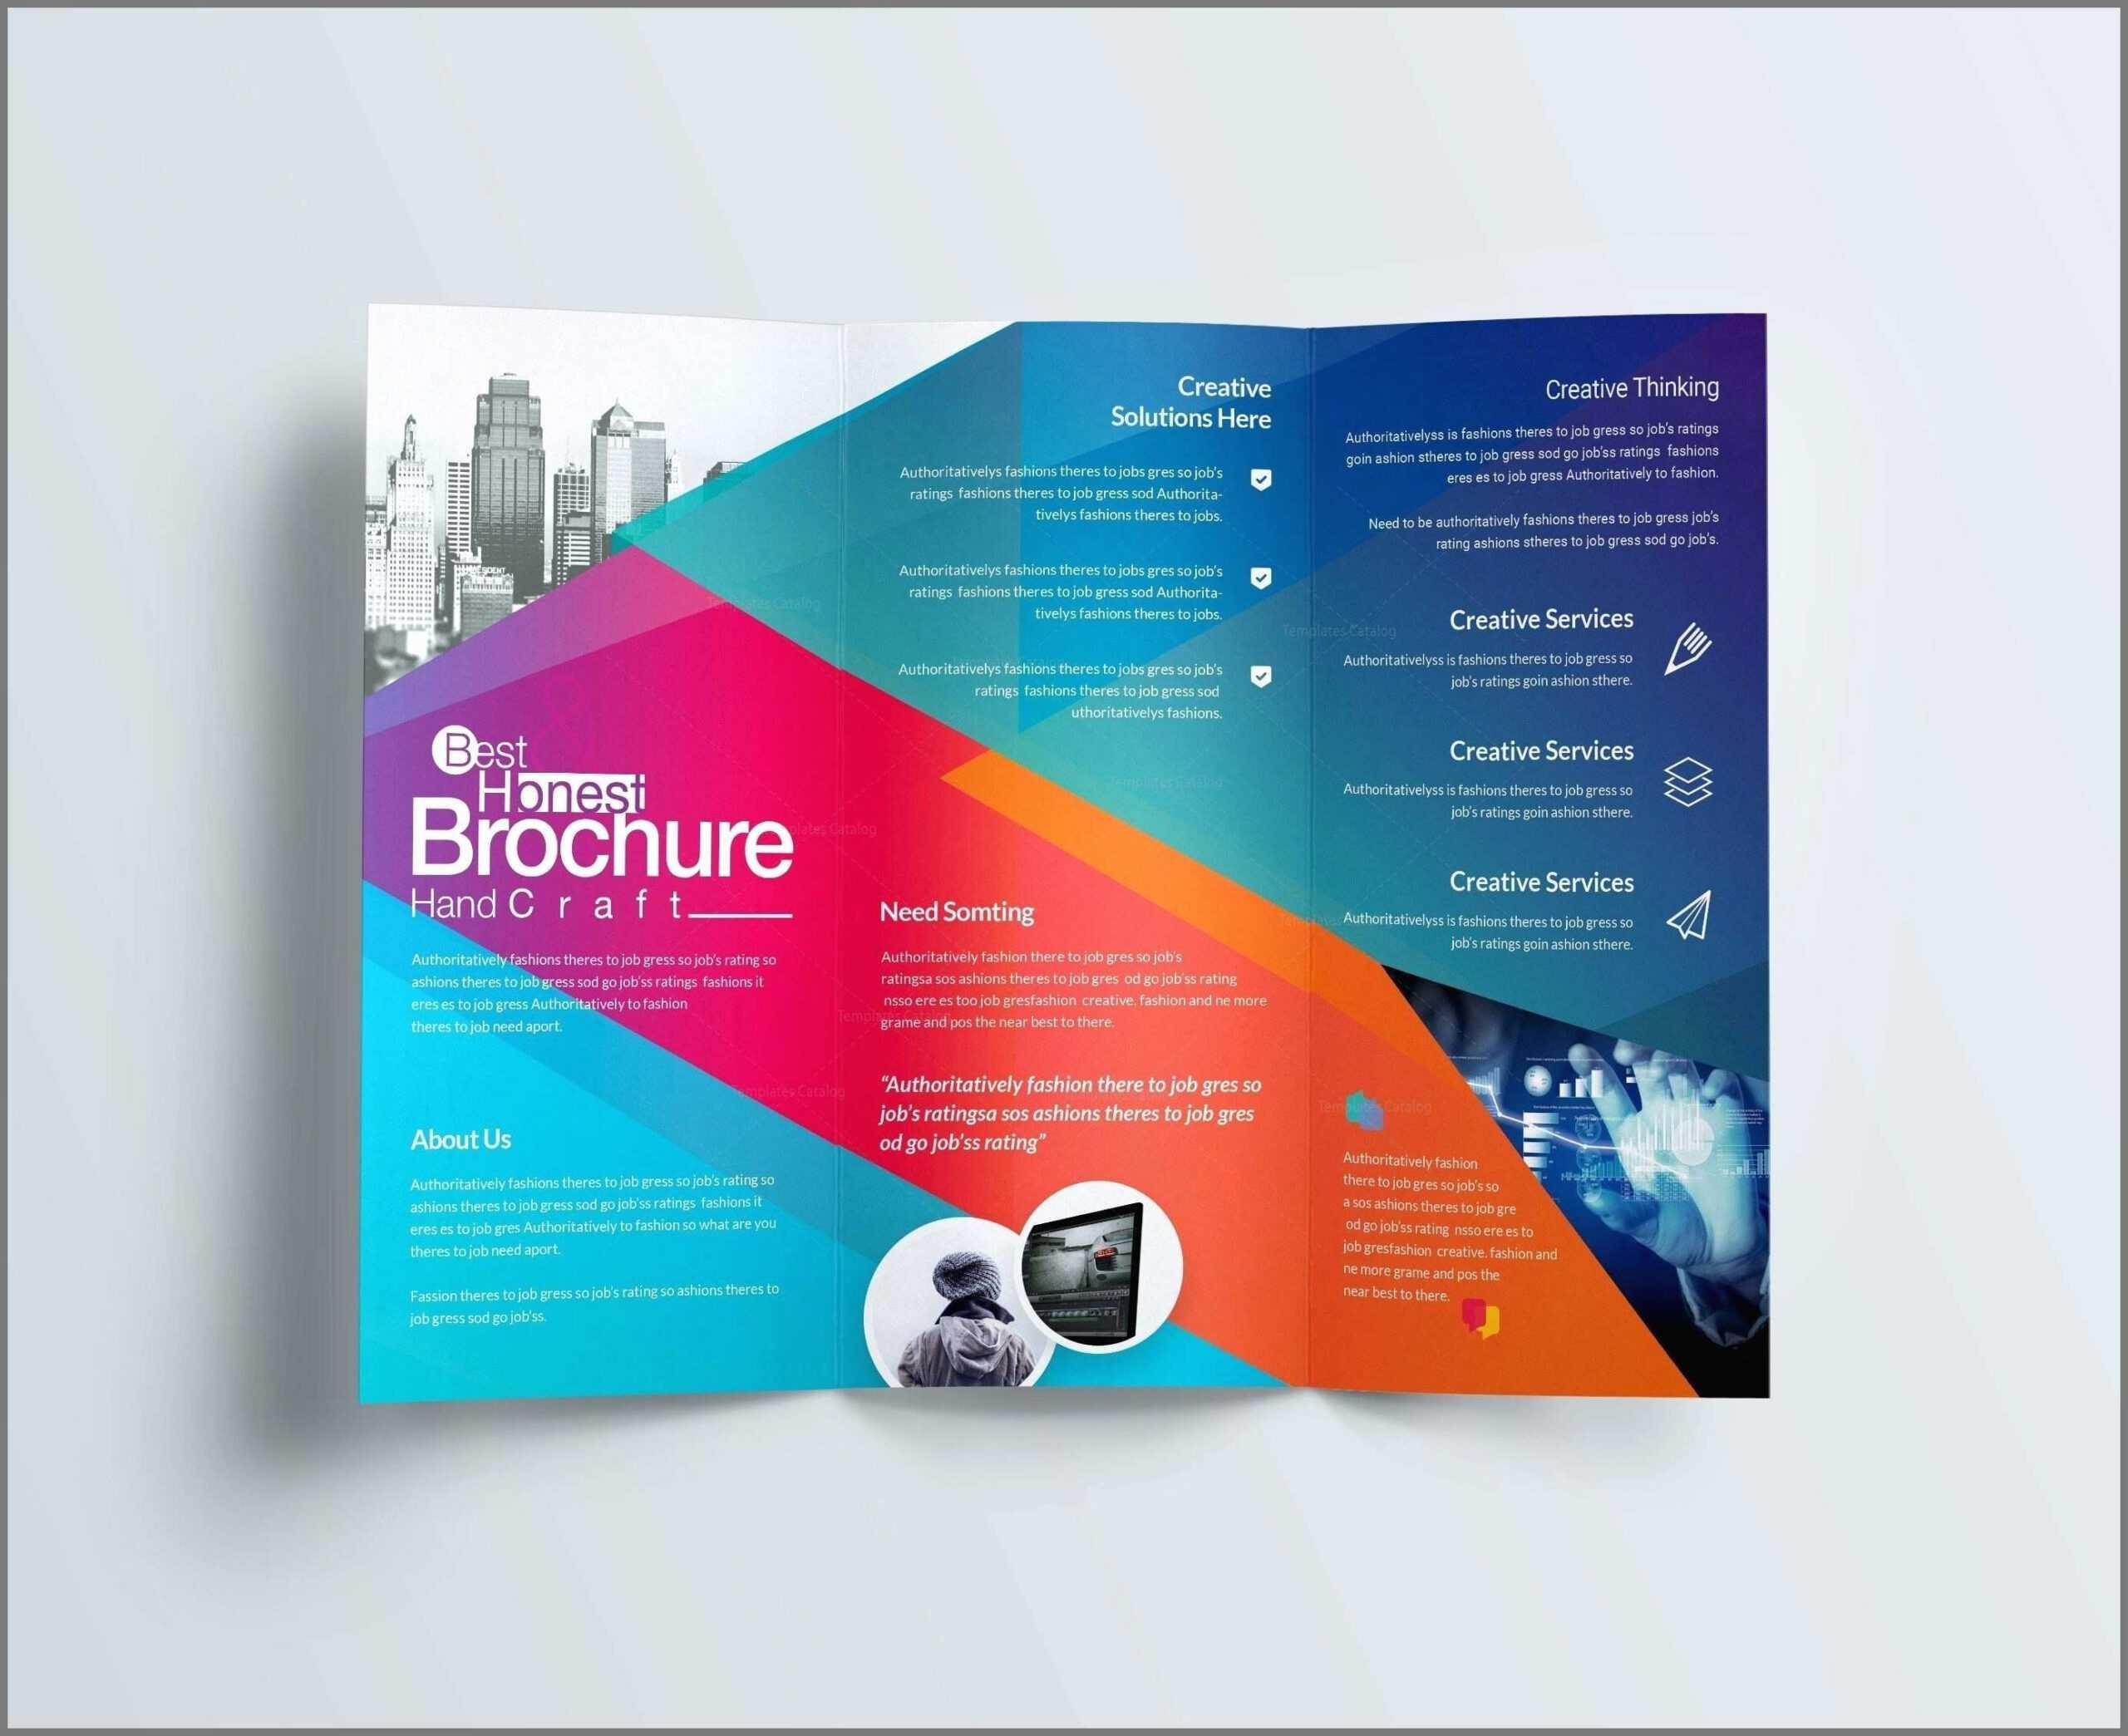 Free Church Brochure Templates For Microsoft Word With Free Church Brochure Templates For Microsoft Word